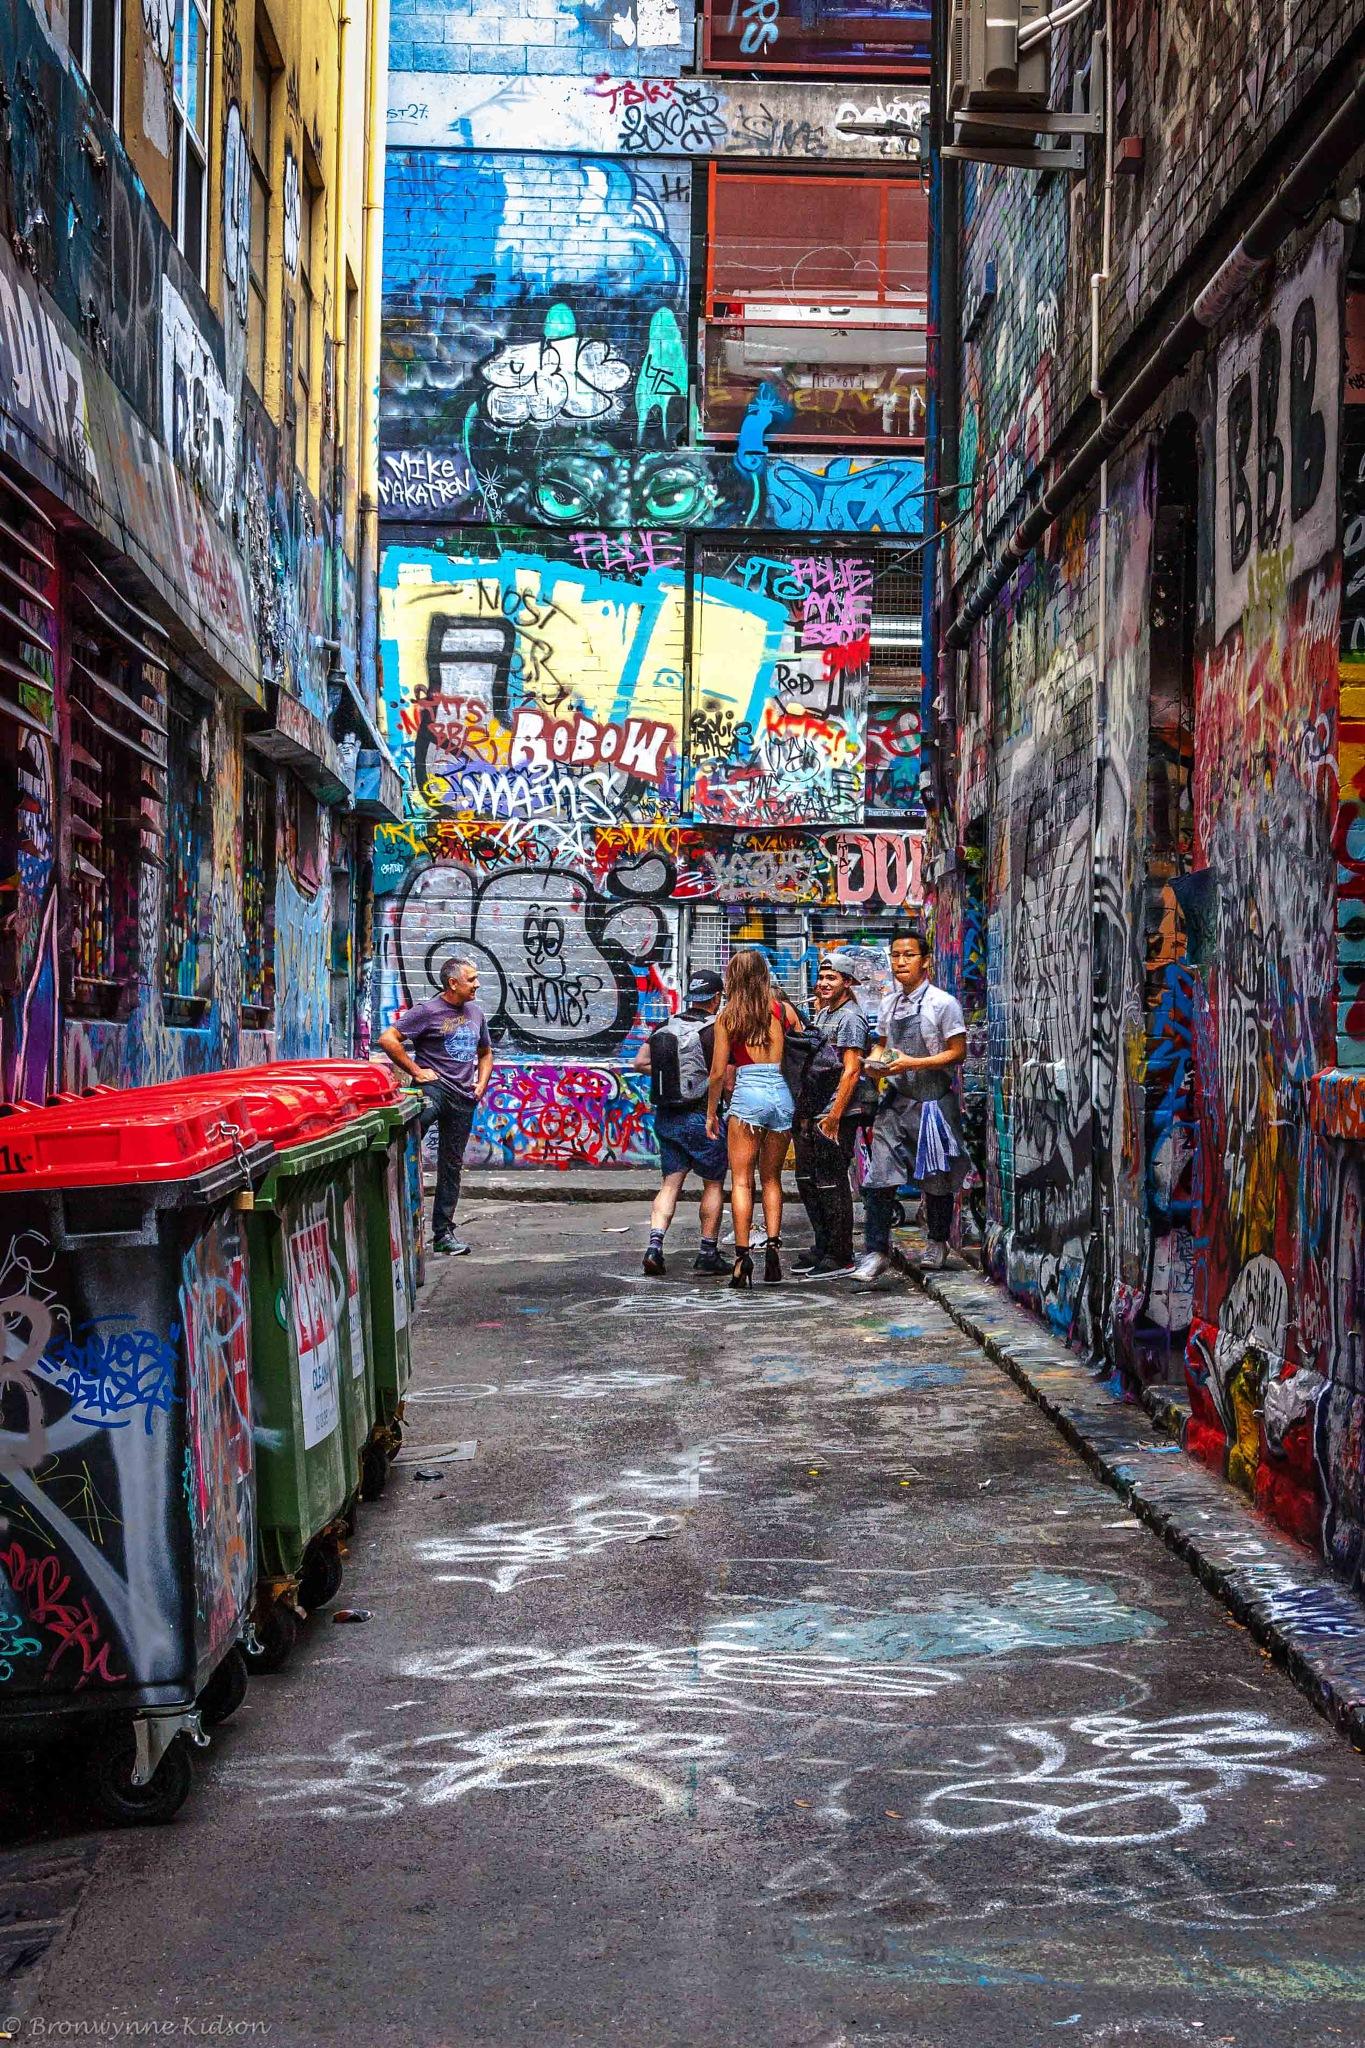 In the Alley by Bronwynne Kidson